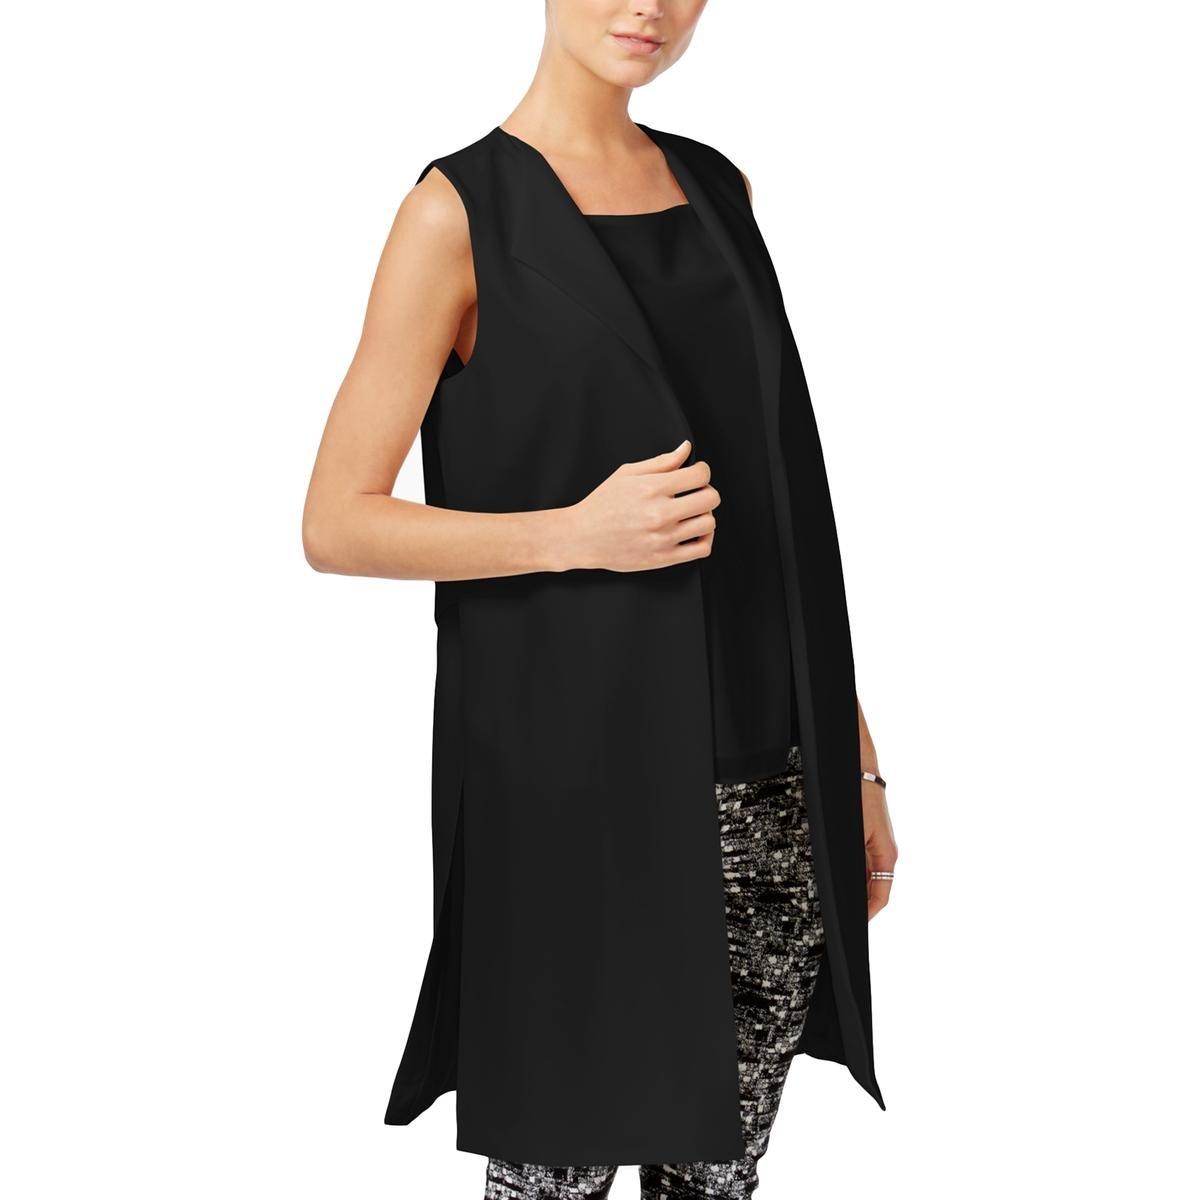 Bar III Womens Solid Long Suit Vest Black XL by Bar III